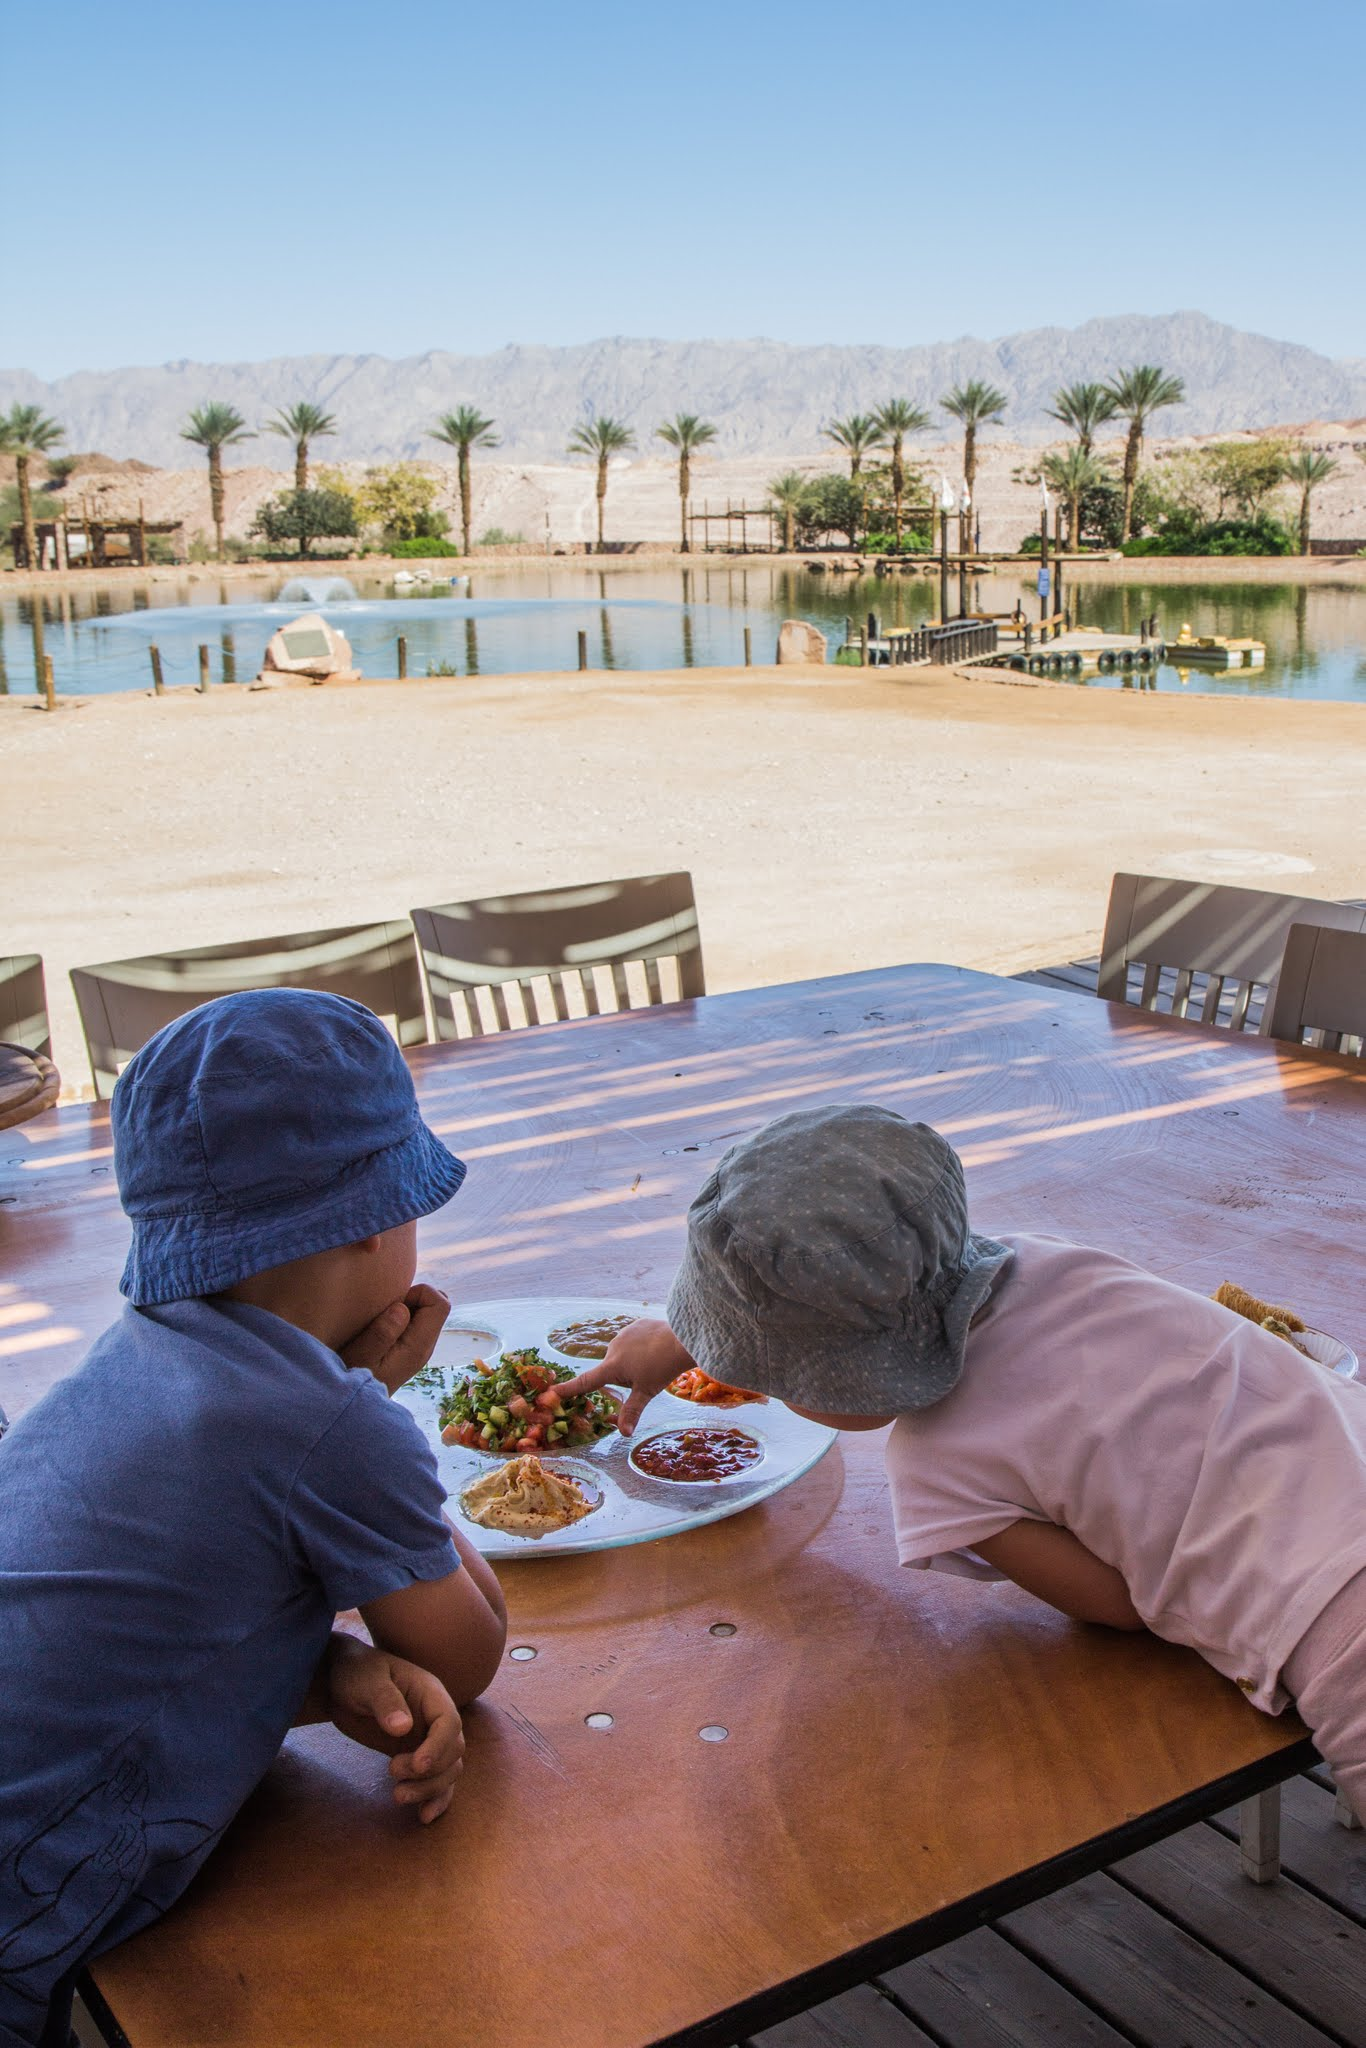 Timna Park w Izraelu, jeziorko i restauracja